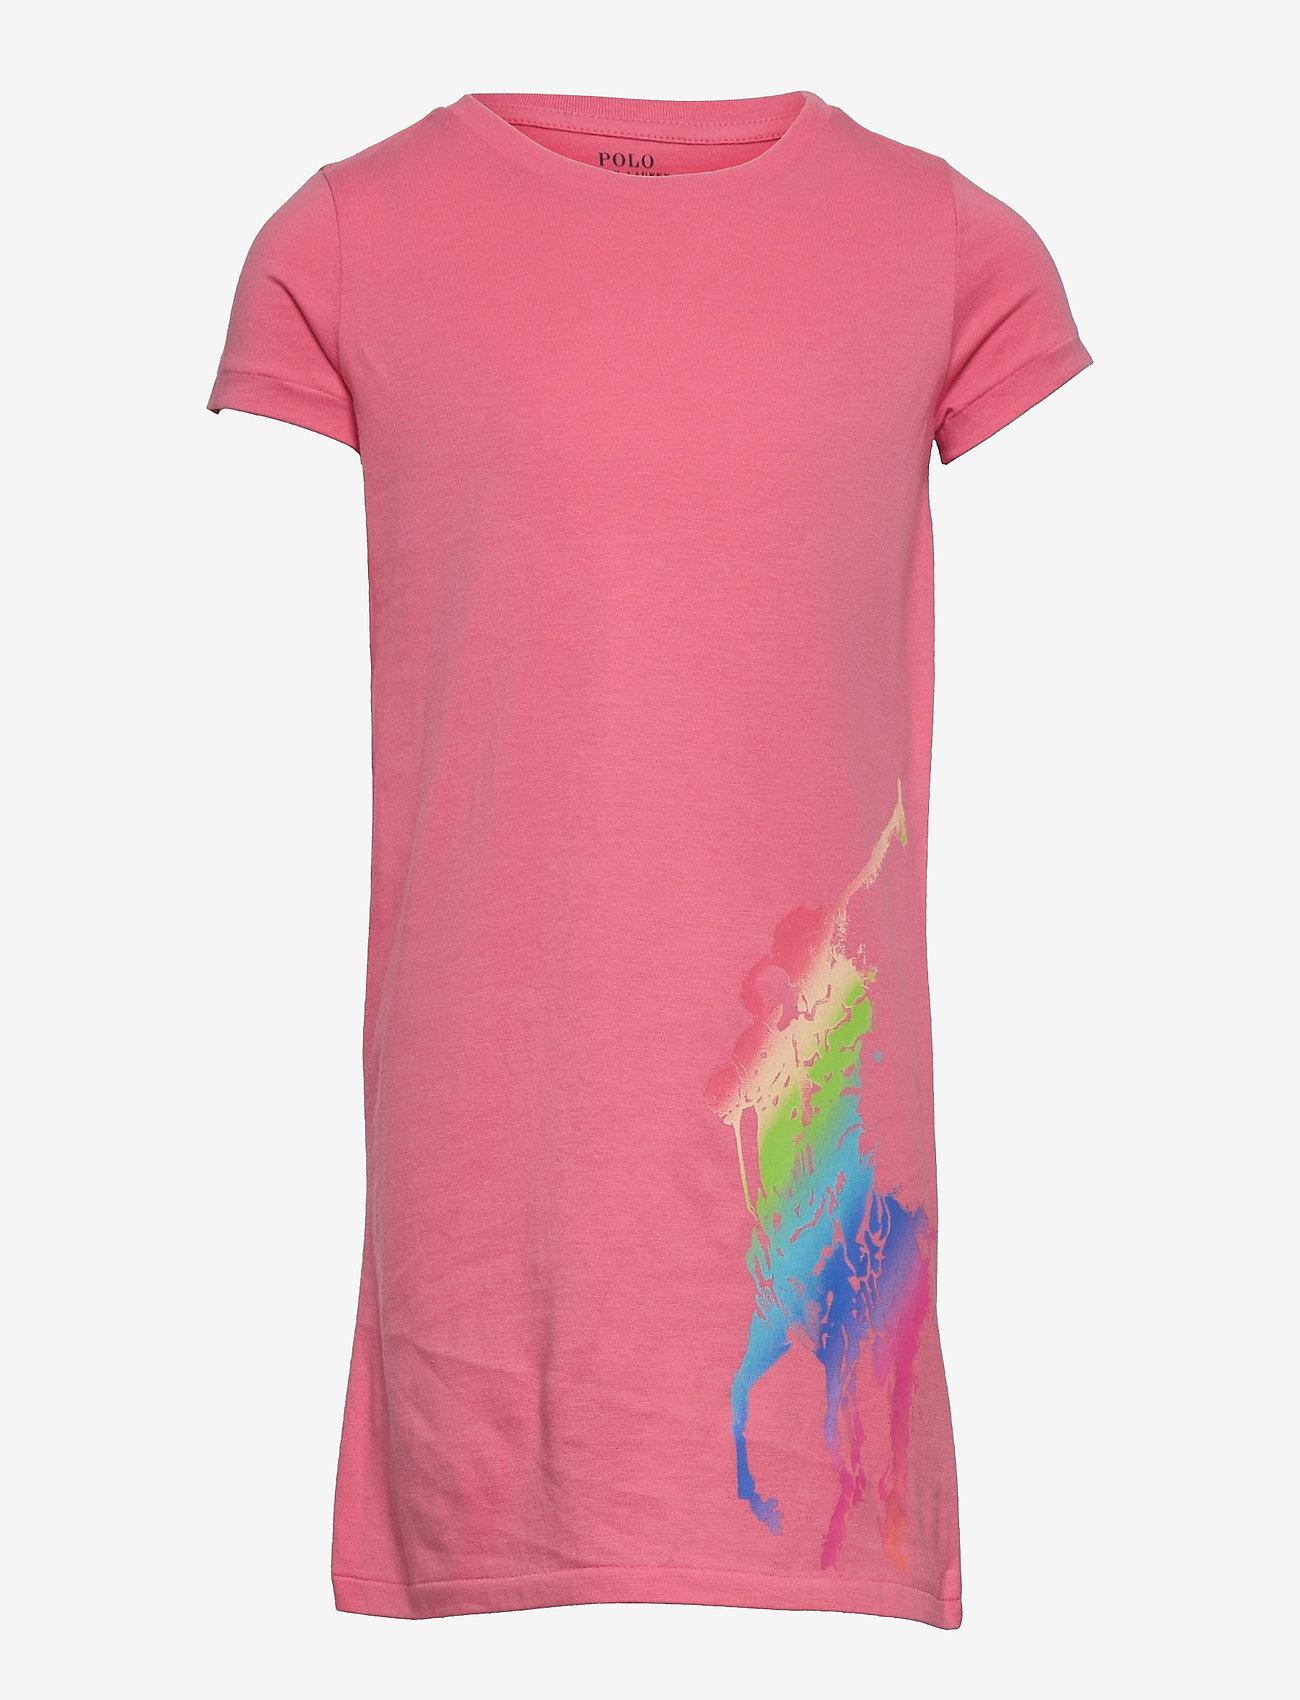 Ralph Lauren Kids - Big Pony Cotton Jersey Tee Dress - kleider - ribbon pink - 0